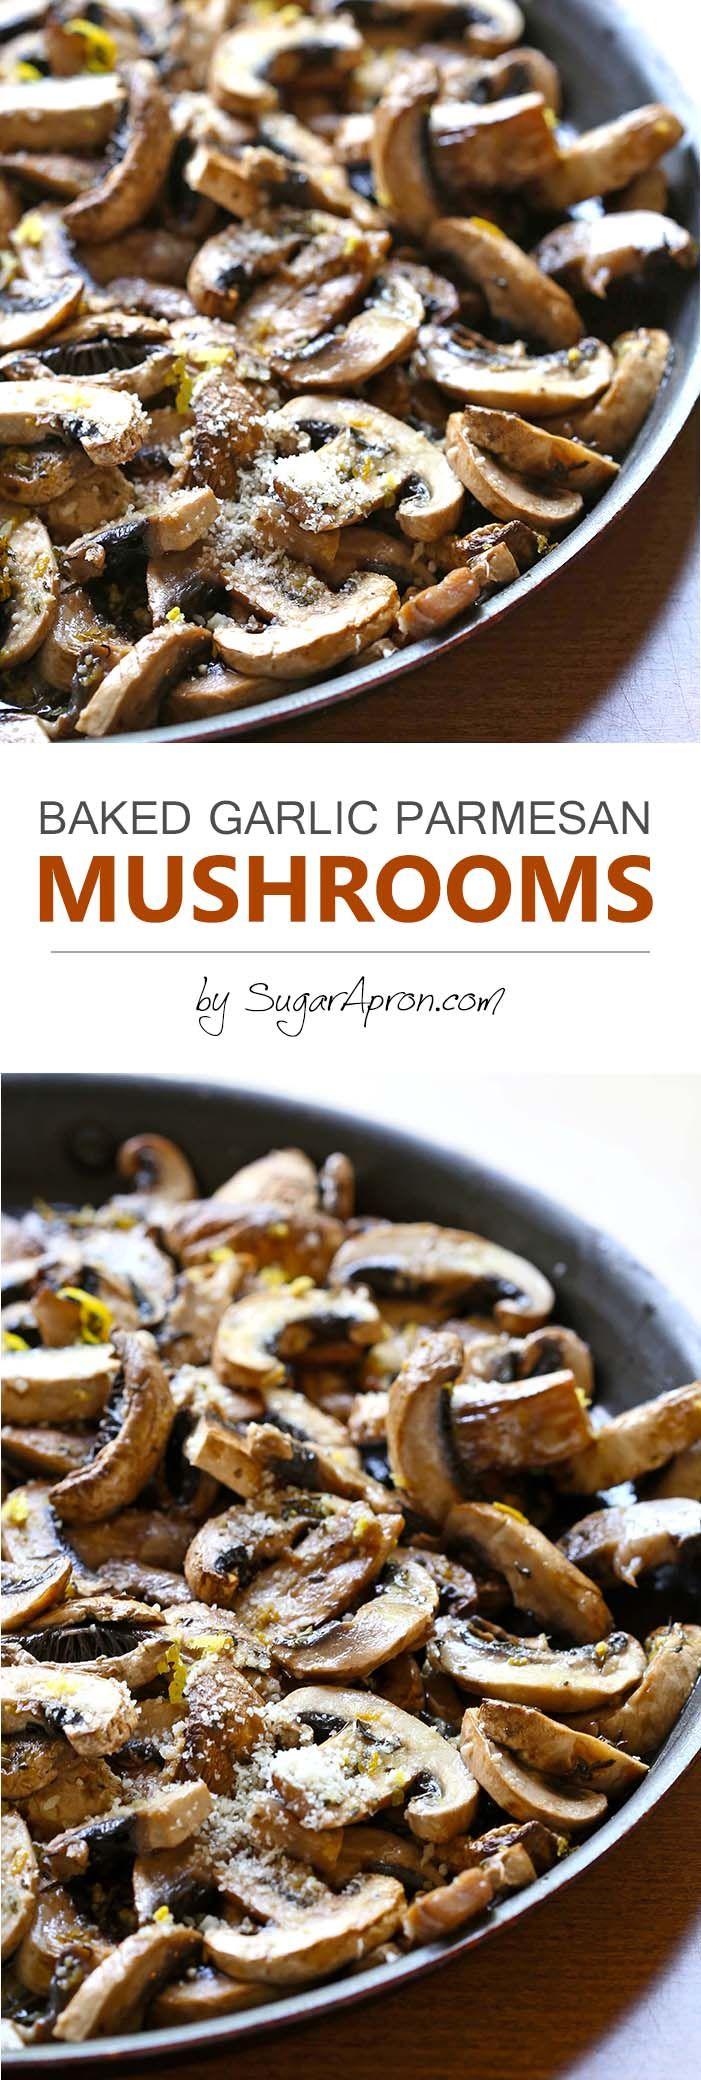 Baked Garlic Parmesan Mushrooms